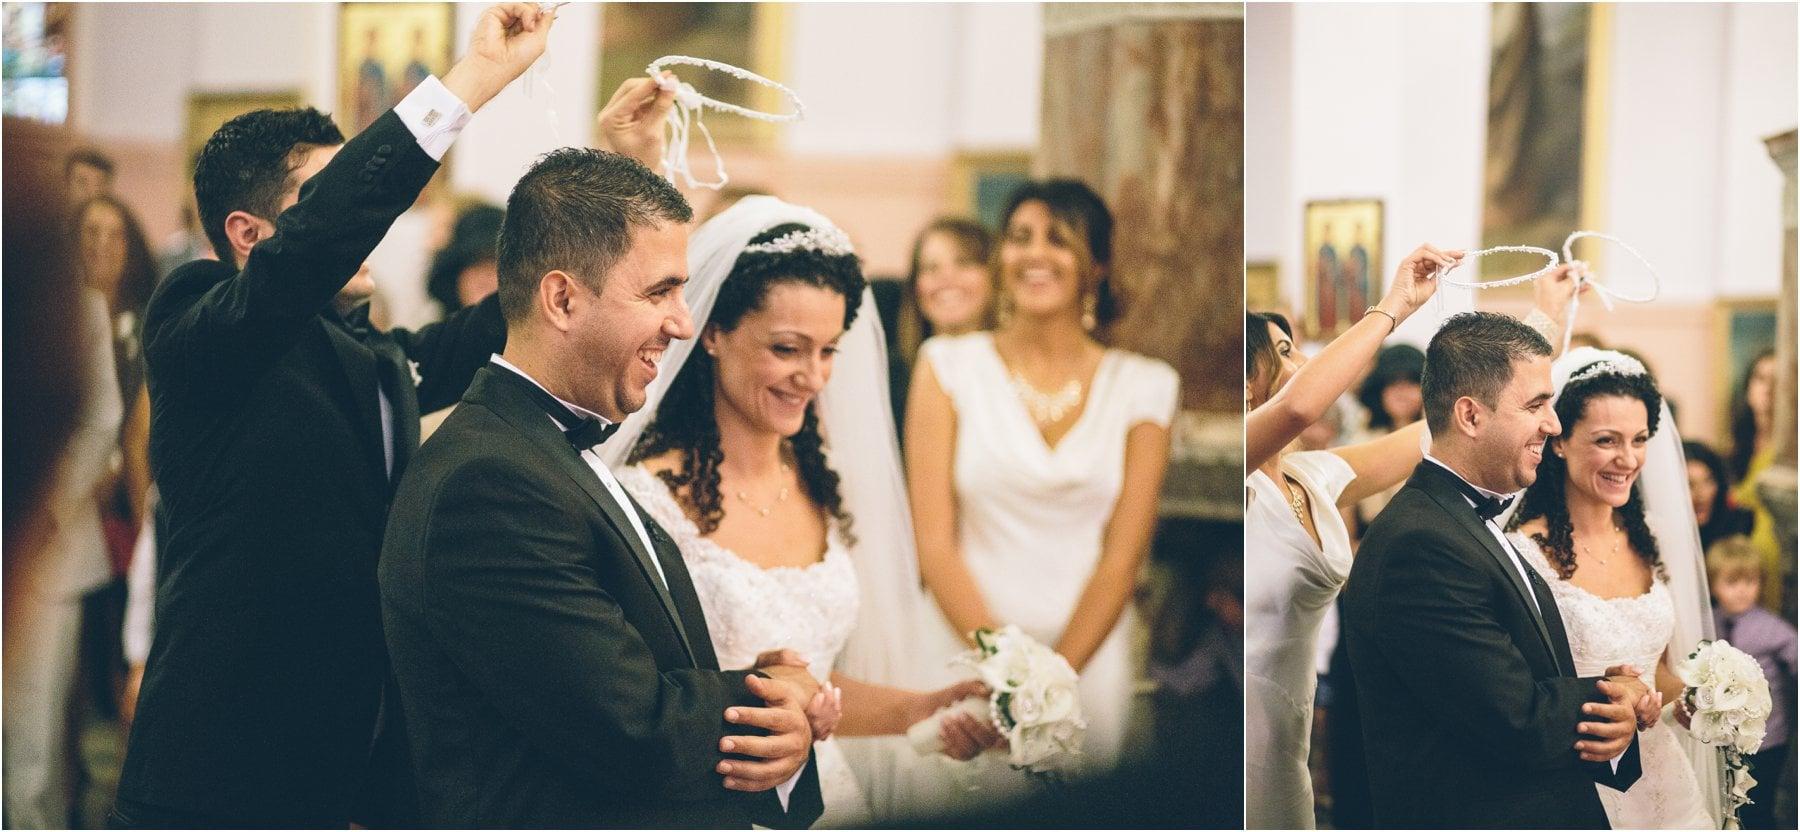 Midland_Manchester_Wedding_Photography_0068